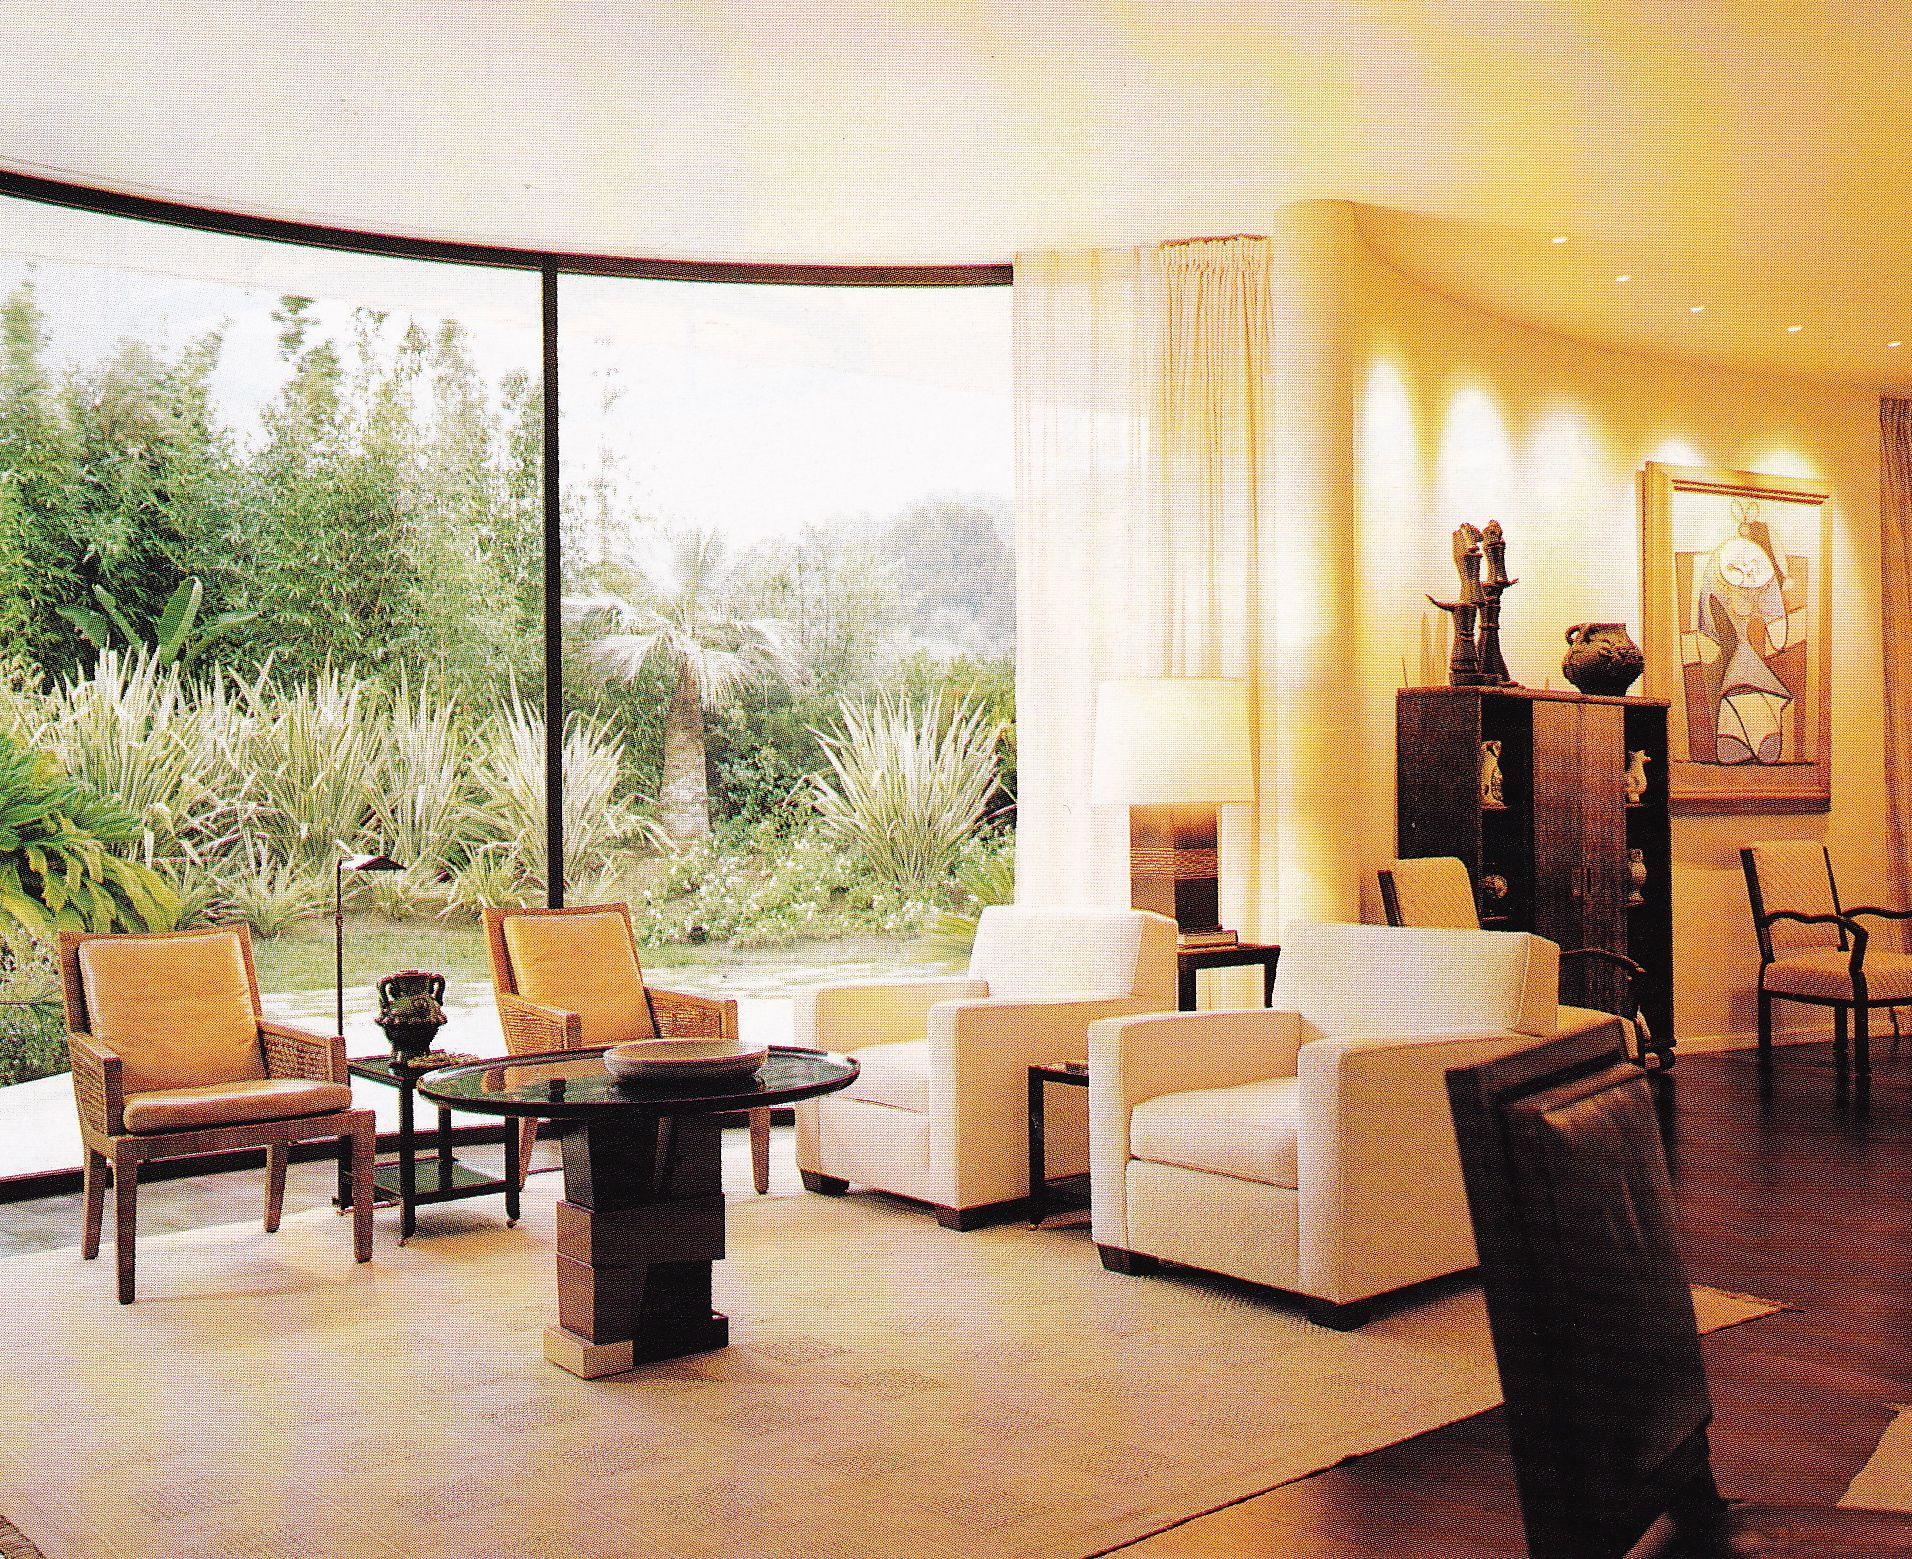 Stupell yorkie dog 3 panel decorative fireplace screen - Villa Mondadori By Oscar Niemeyer Interiors By Peter Marino